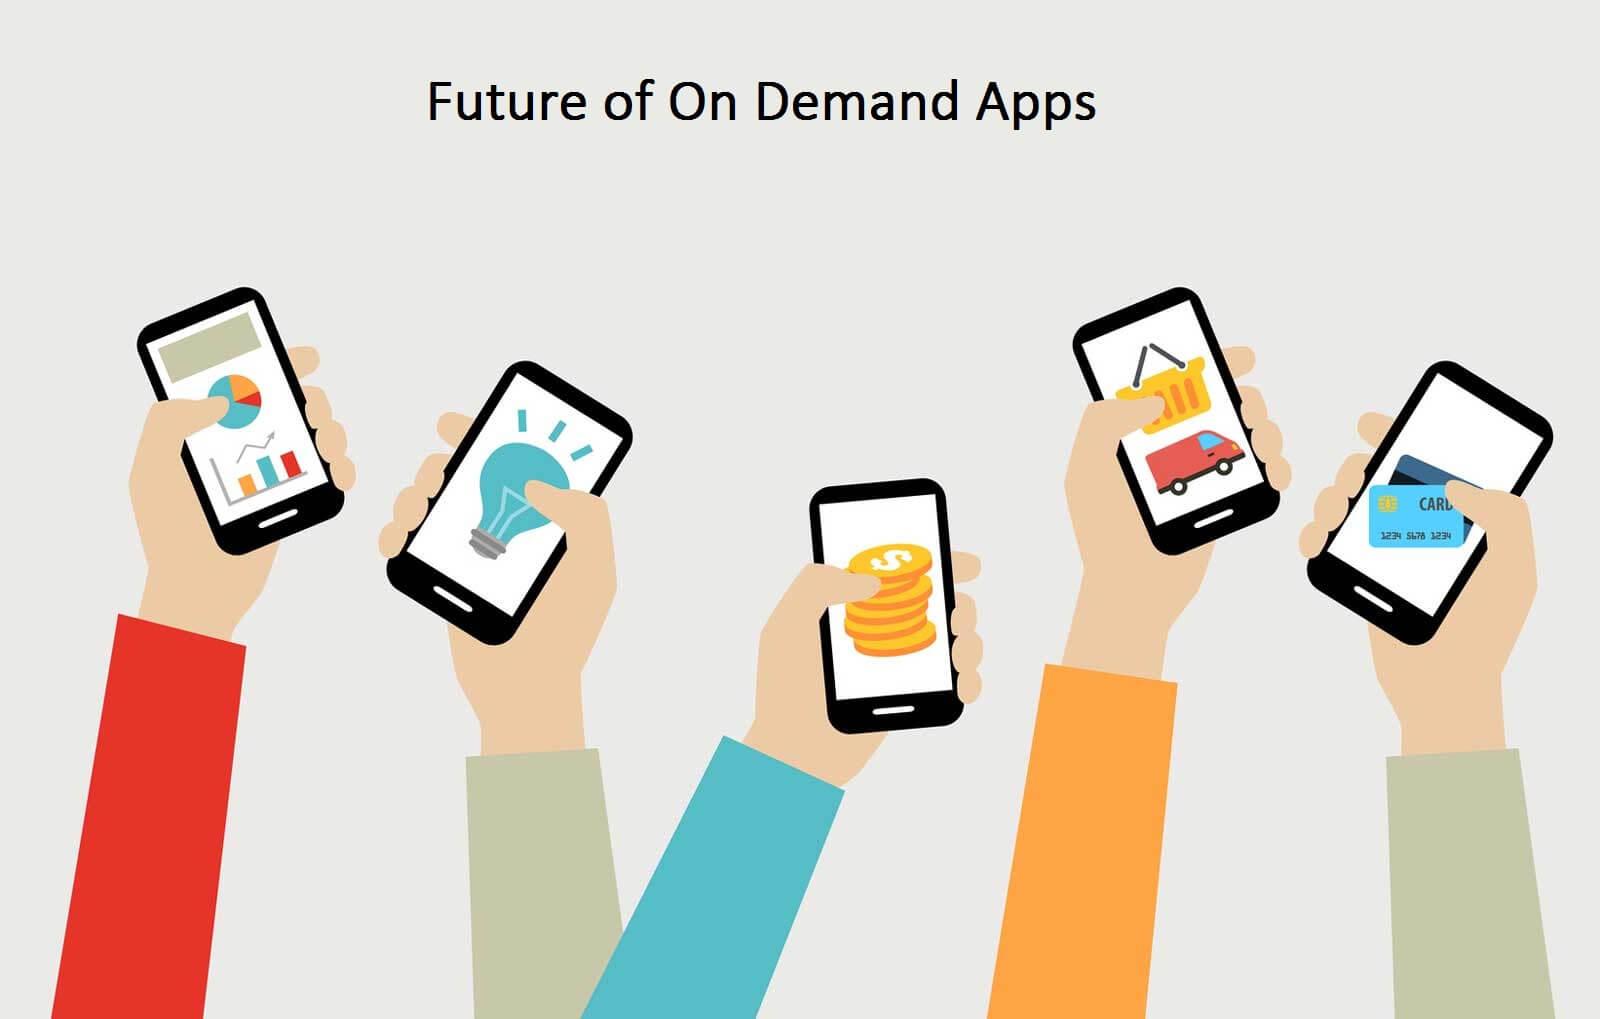 Mobile App Development: On-demand App Trends 2017